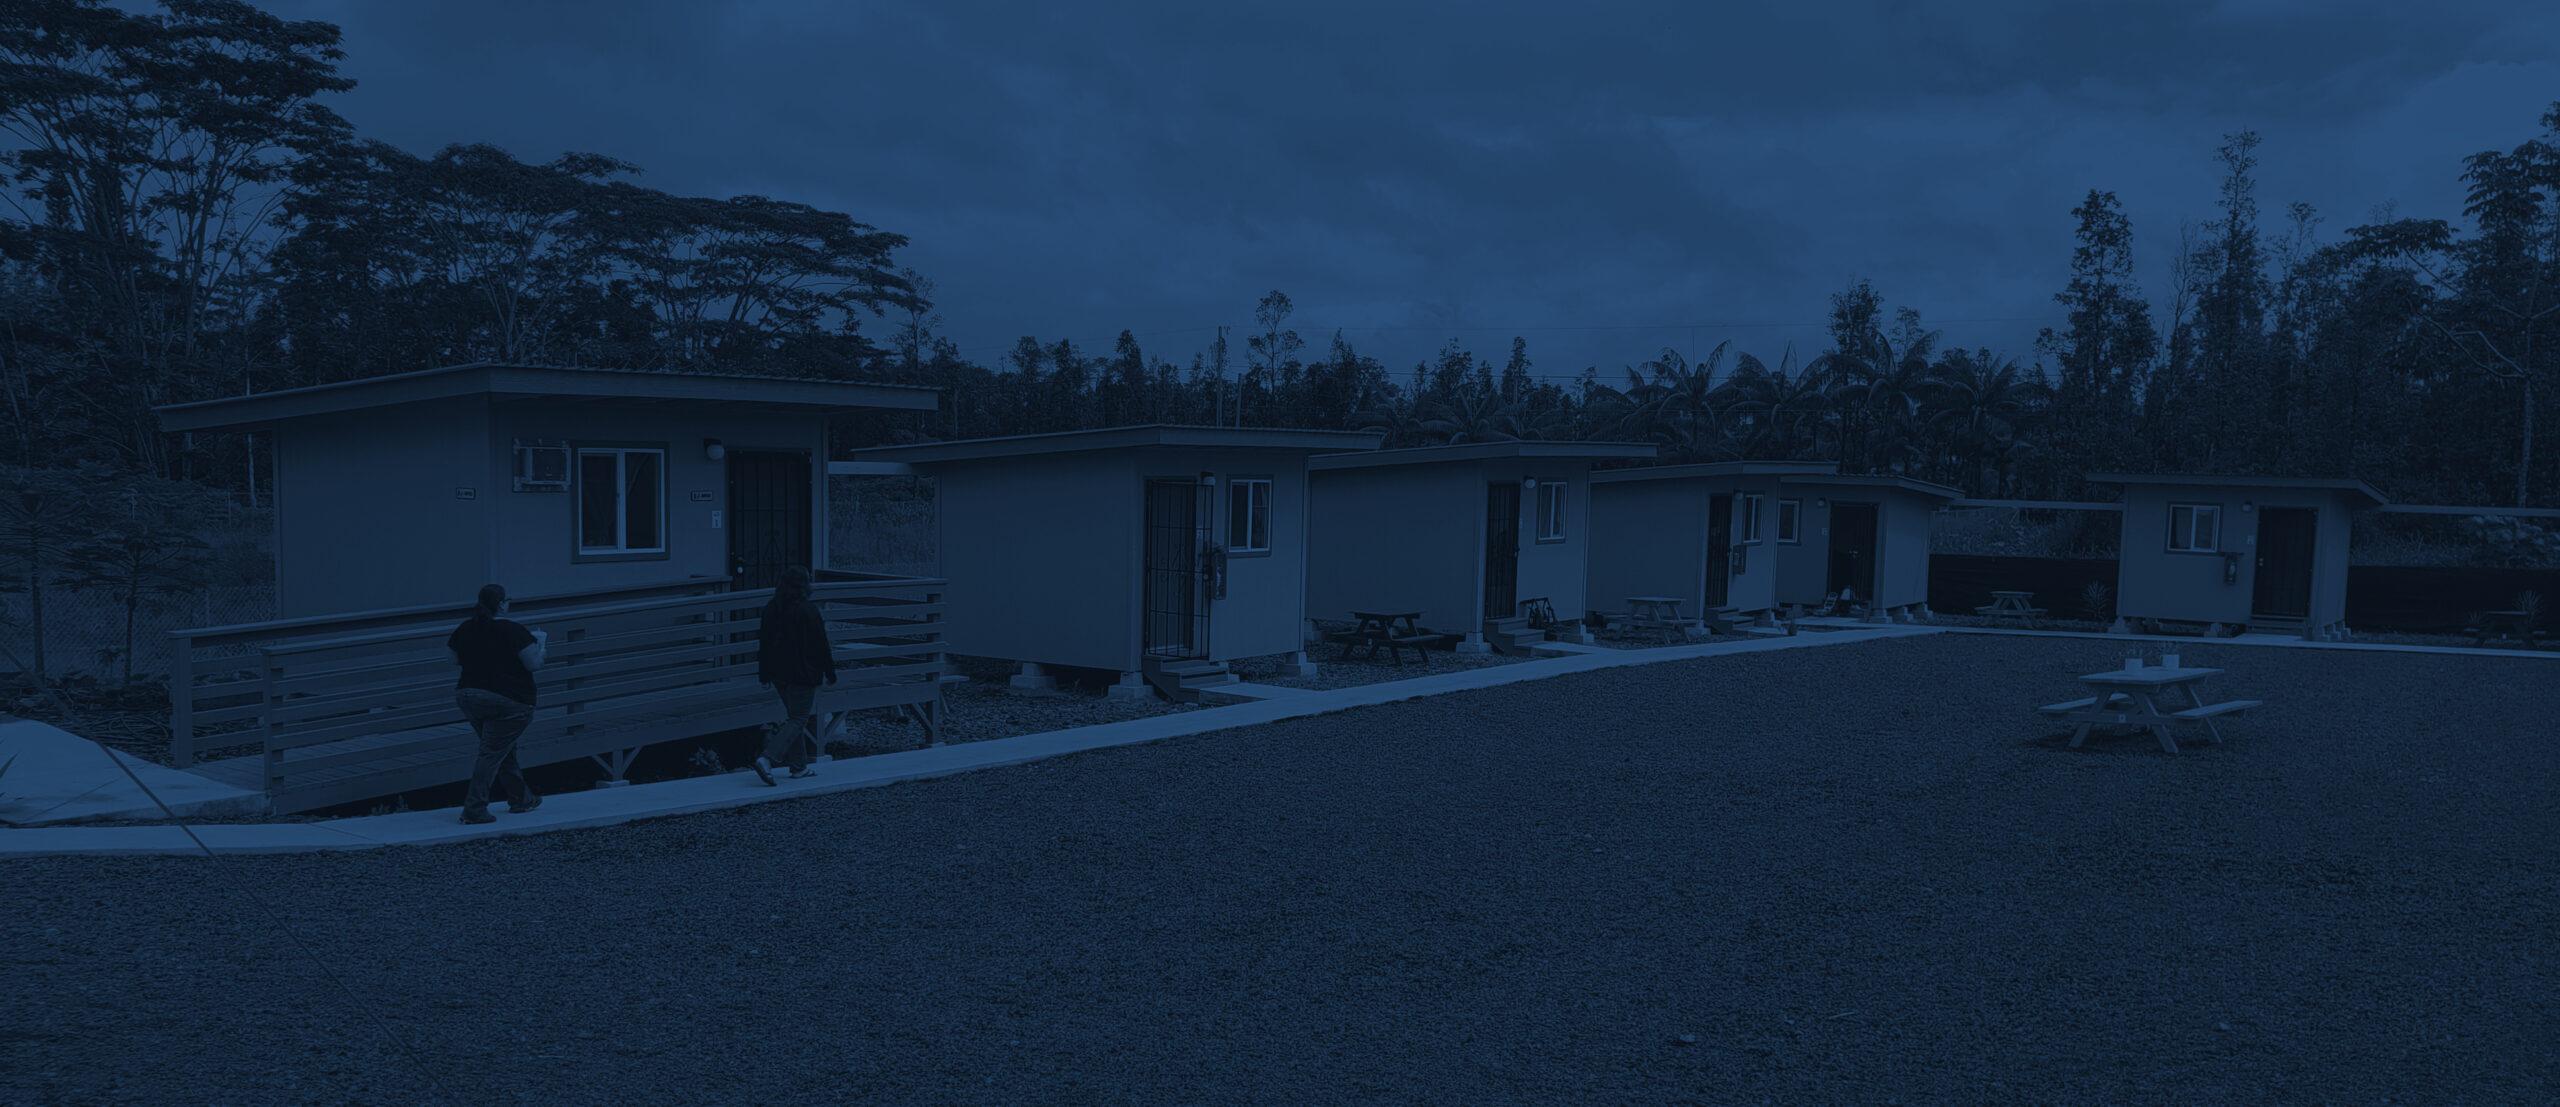 Neighborhood Place of Puna